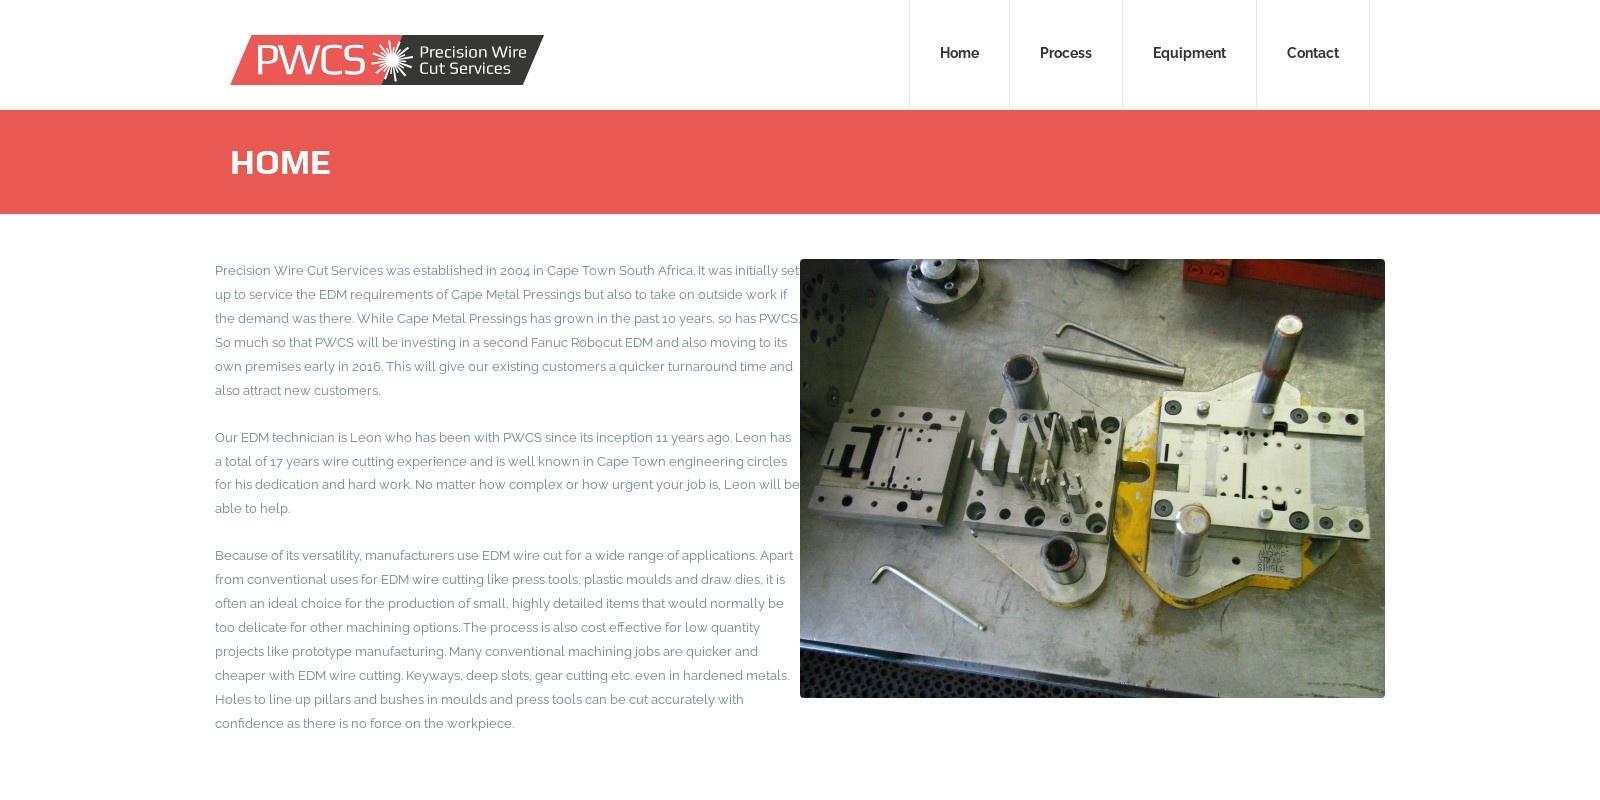 Preview of http://www.precisionwirecutservices.co.za/